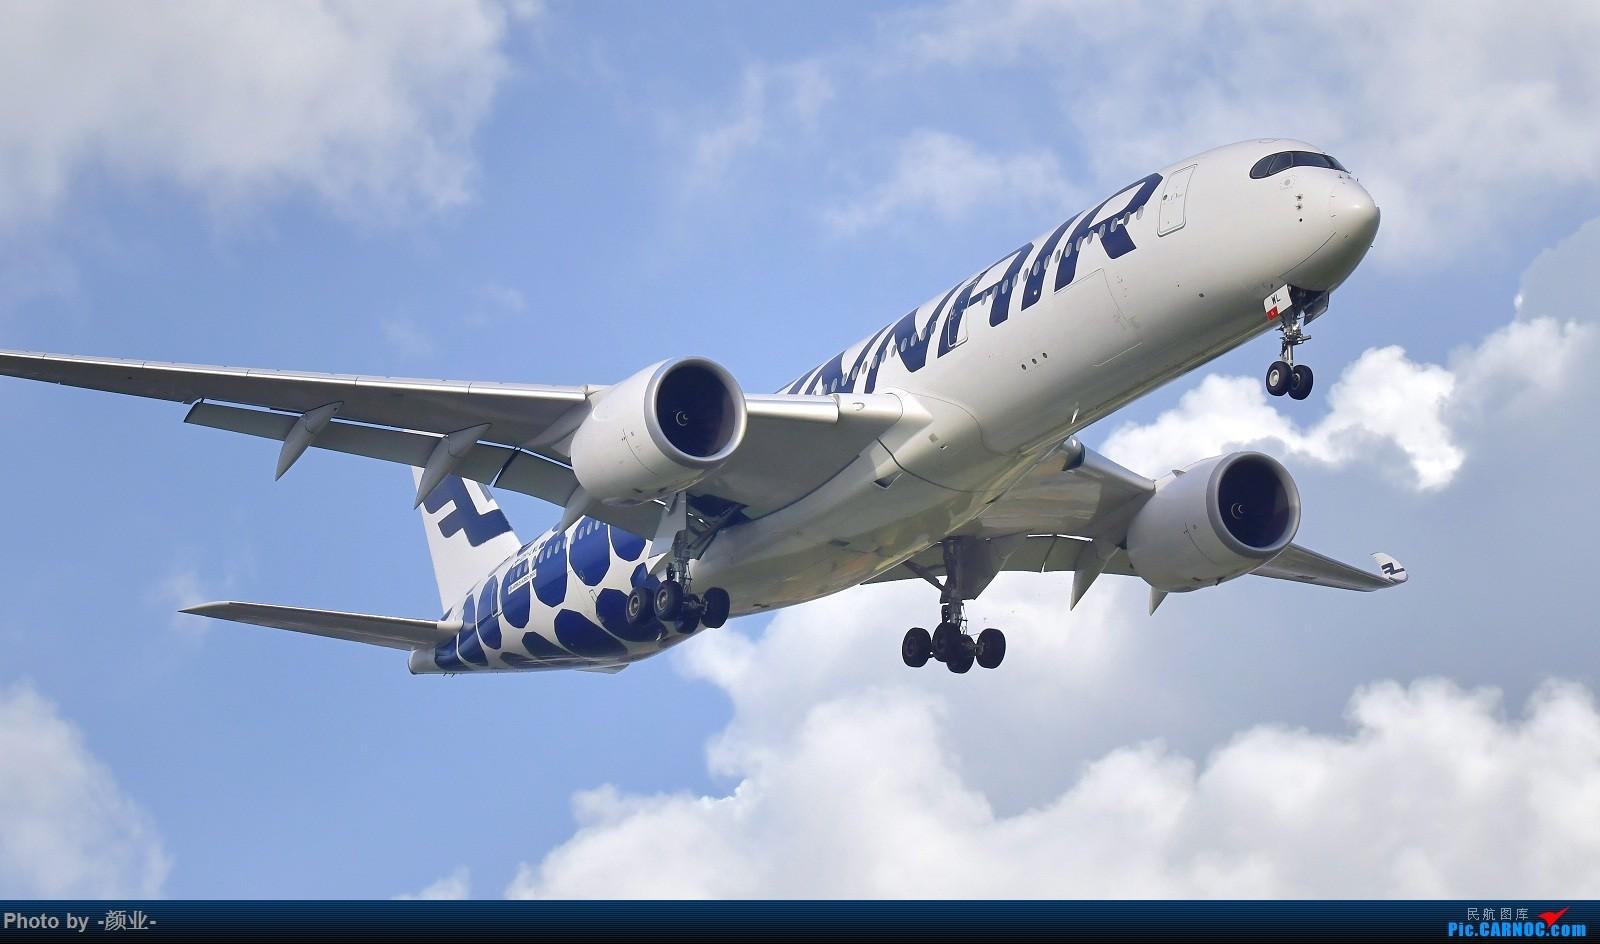 Re:[原创]走近飞机起降点(无尽创意) AIRBUS A350-900 OH-LWL 中国广州白云国际机场